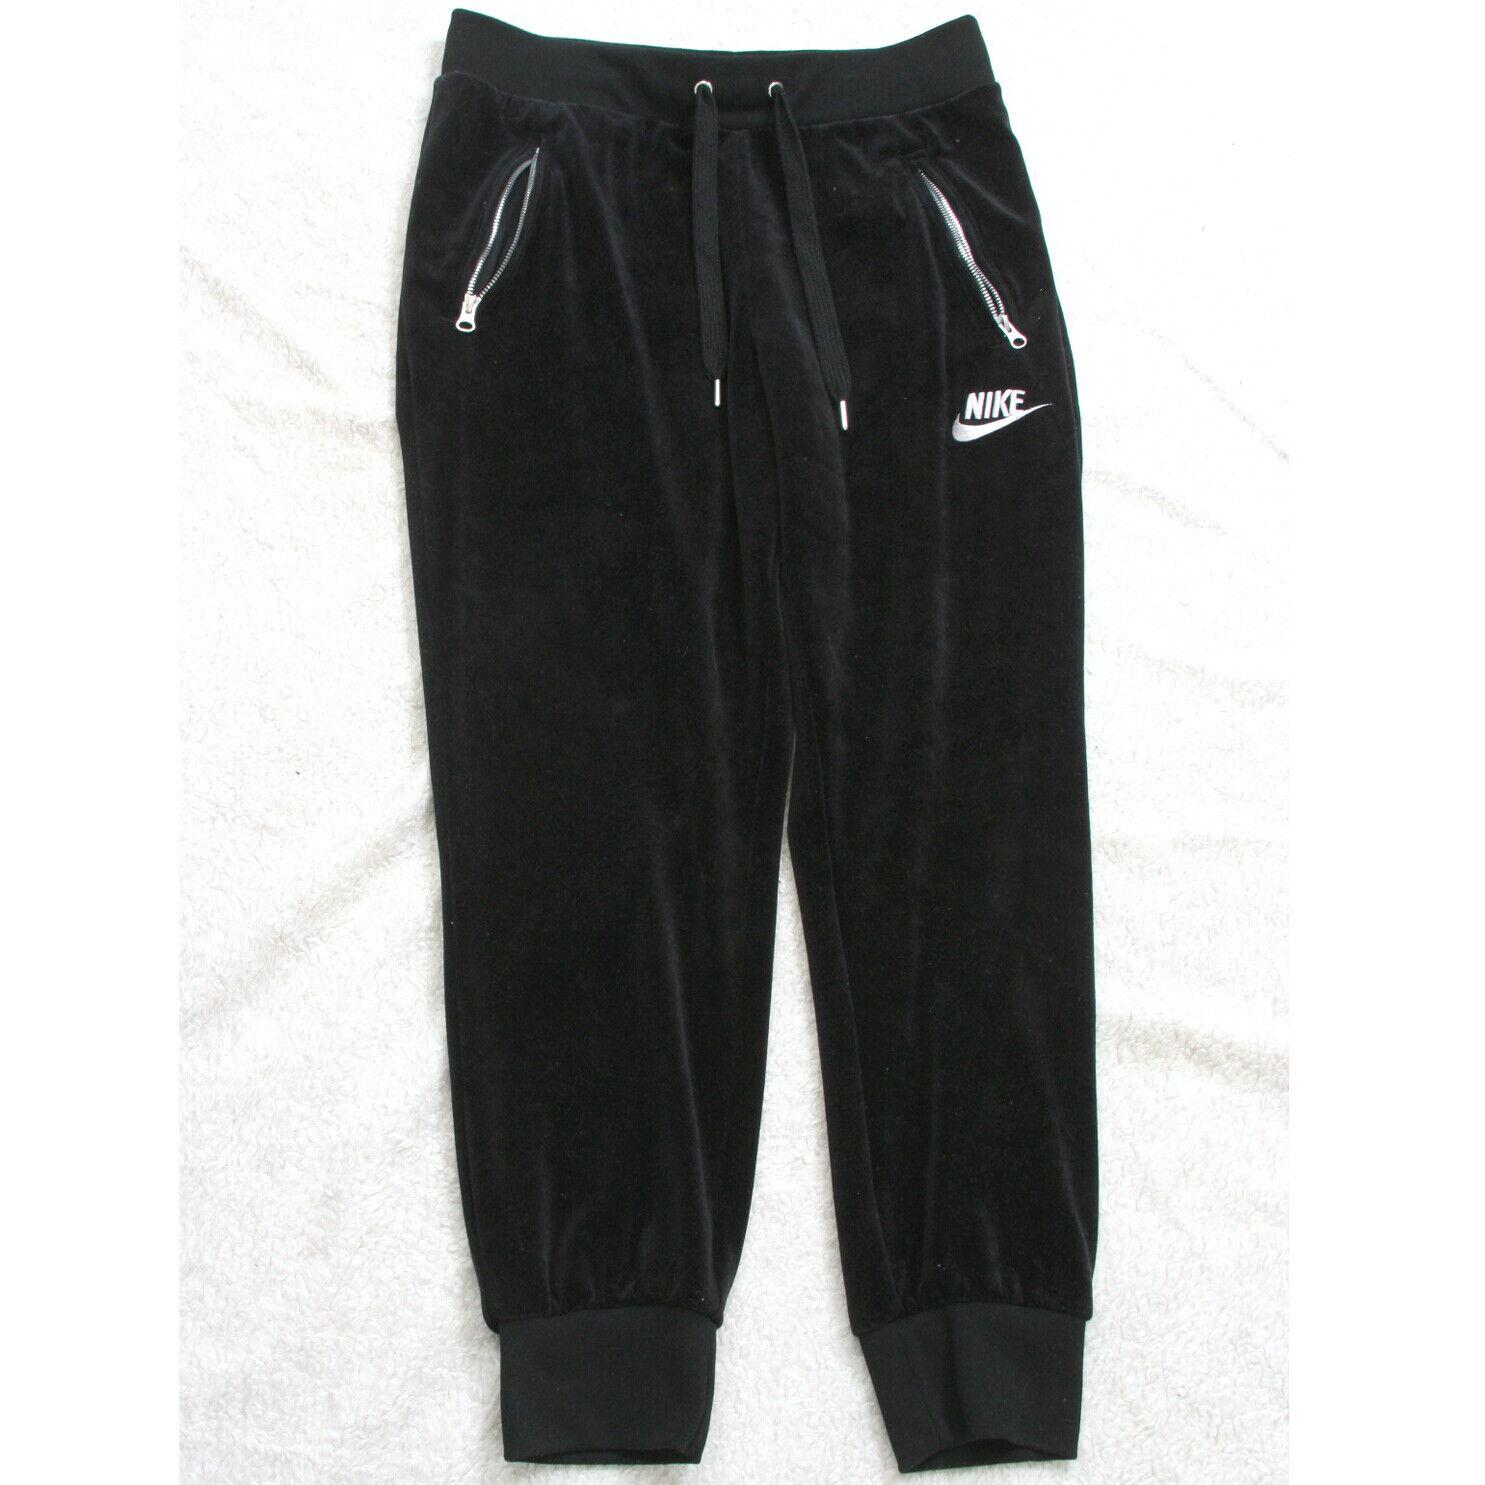 Nike Black Athletic Pants Polyester Spandex Medium Solid Woman's 30